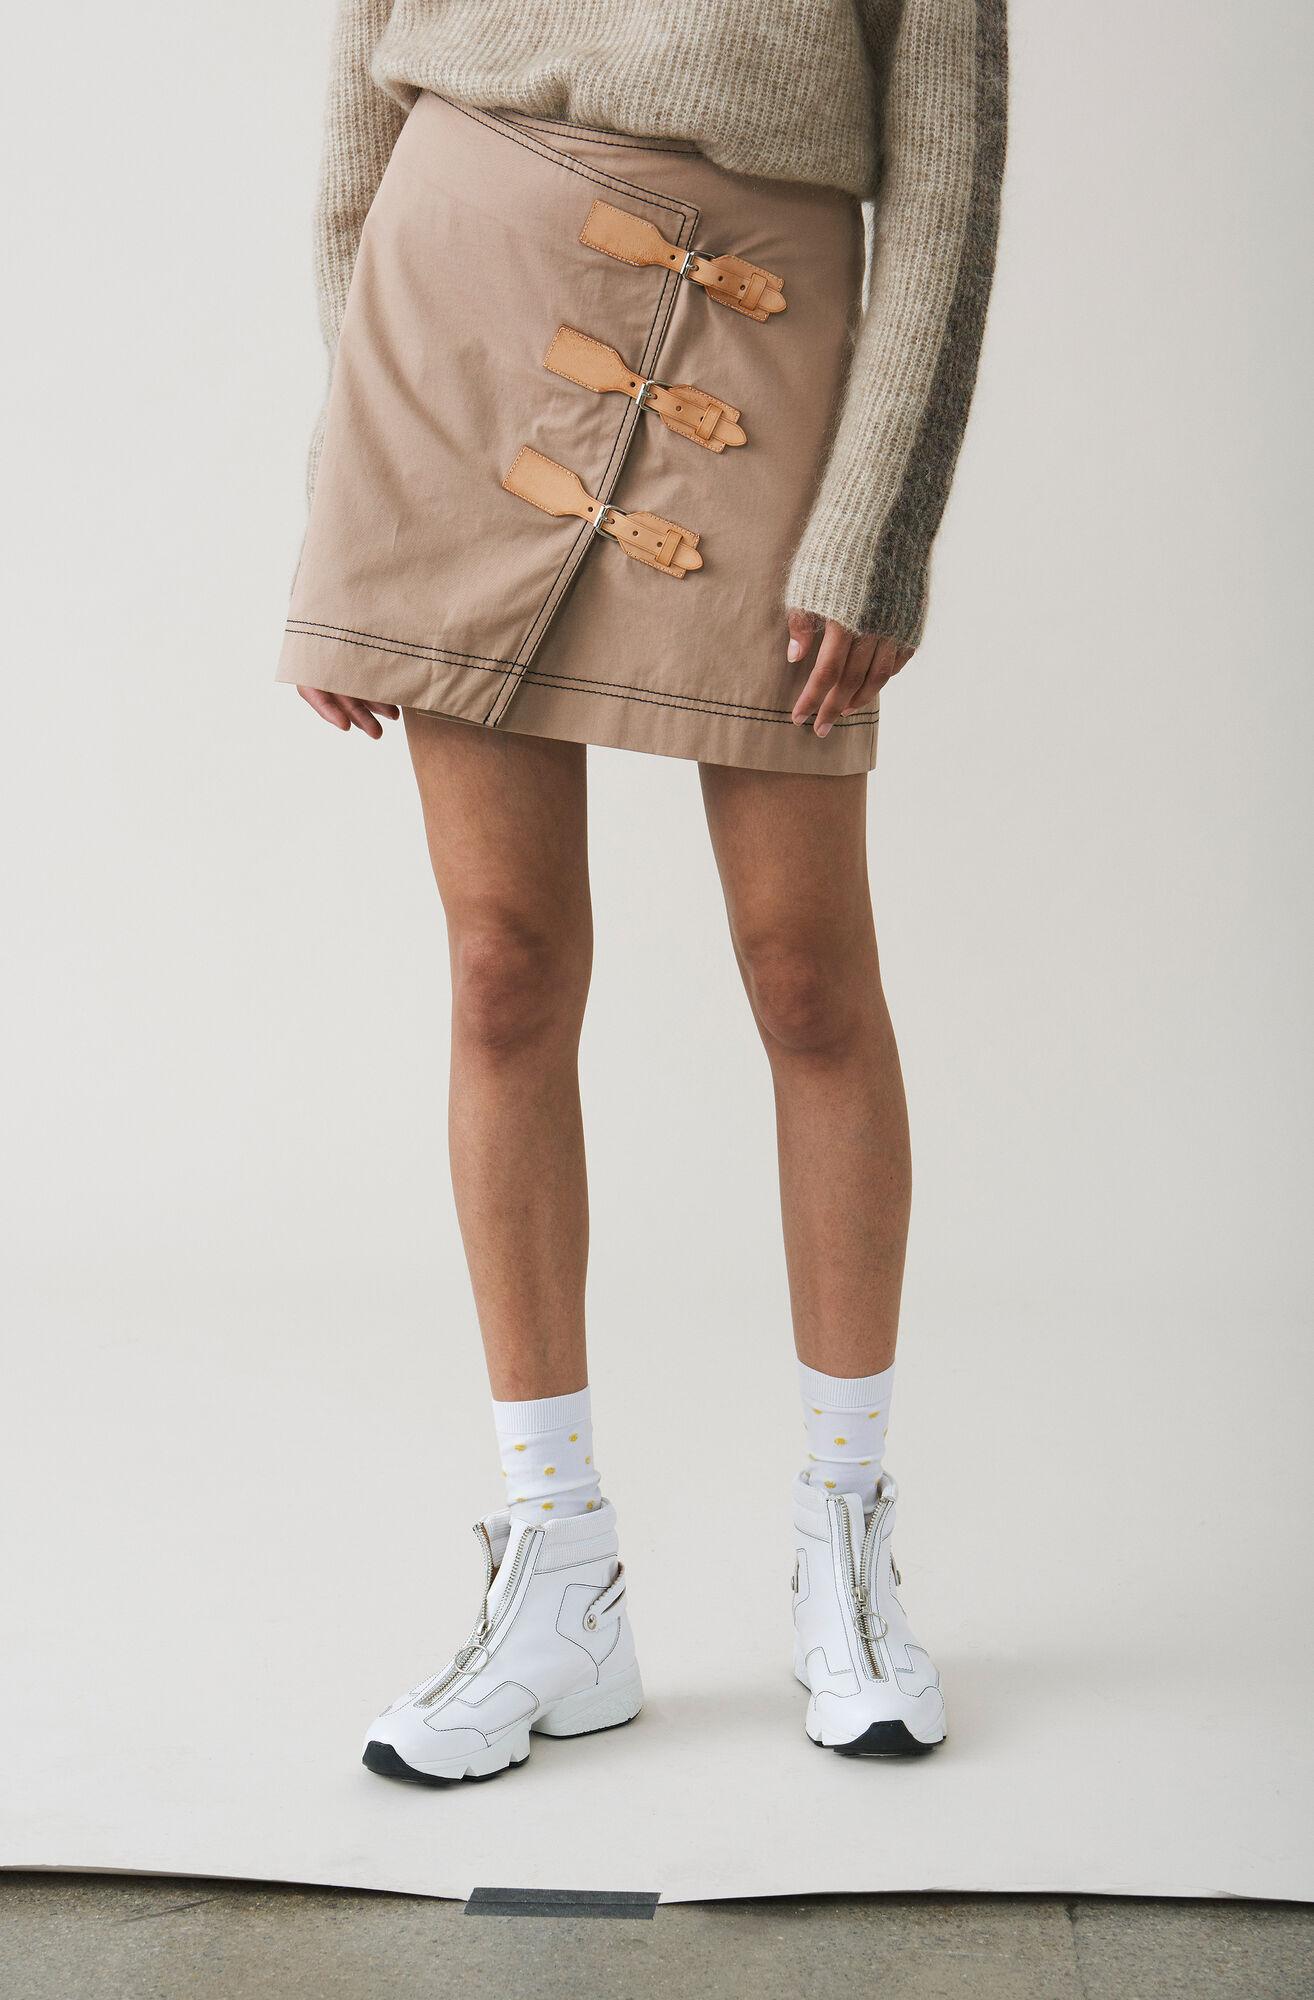 Alana Sneakers, Bright White, hi-res